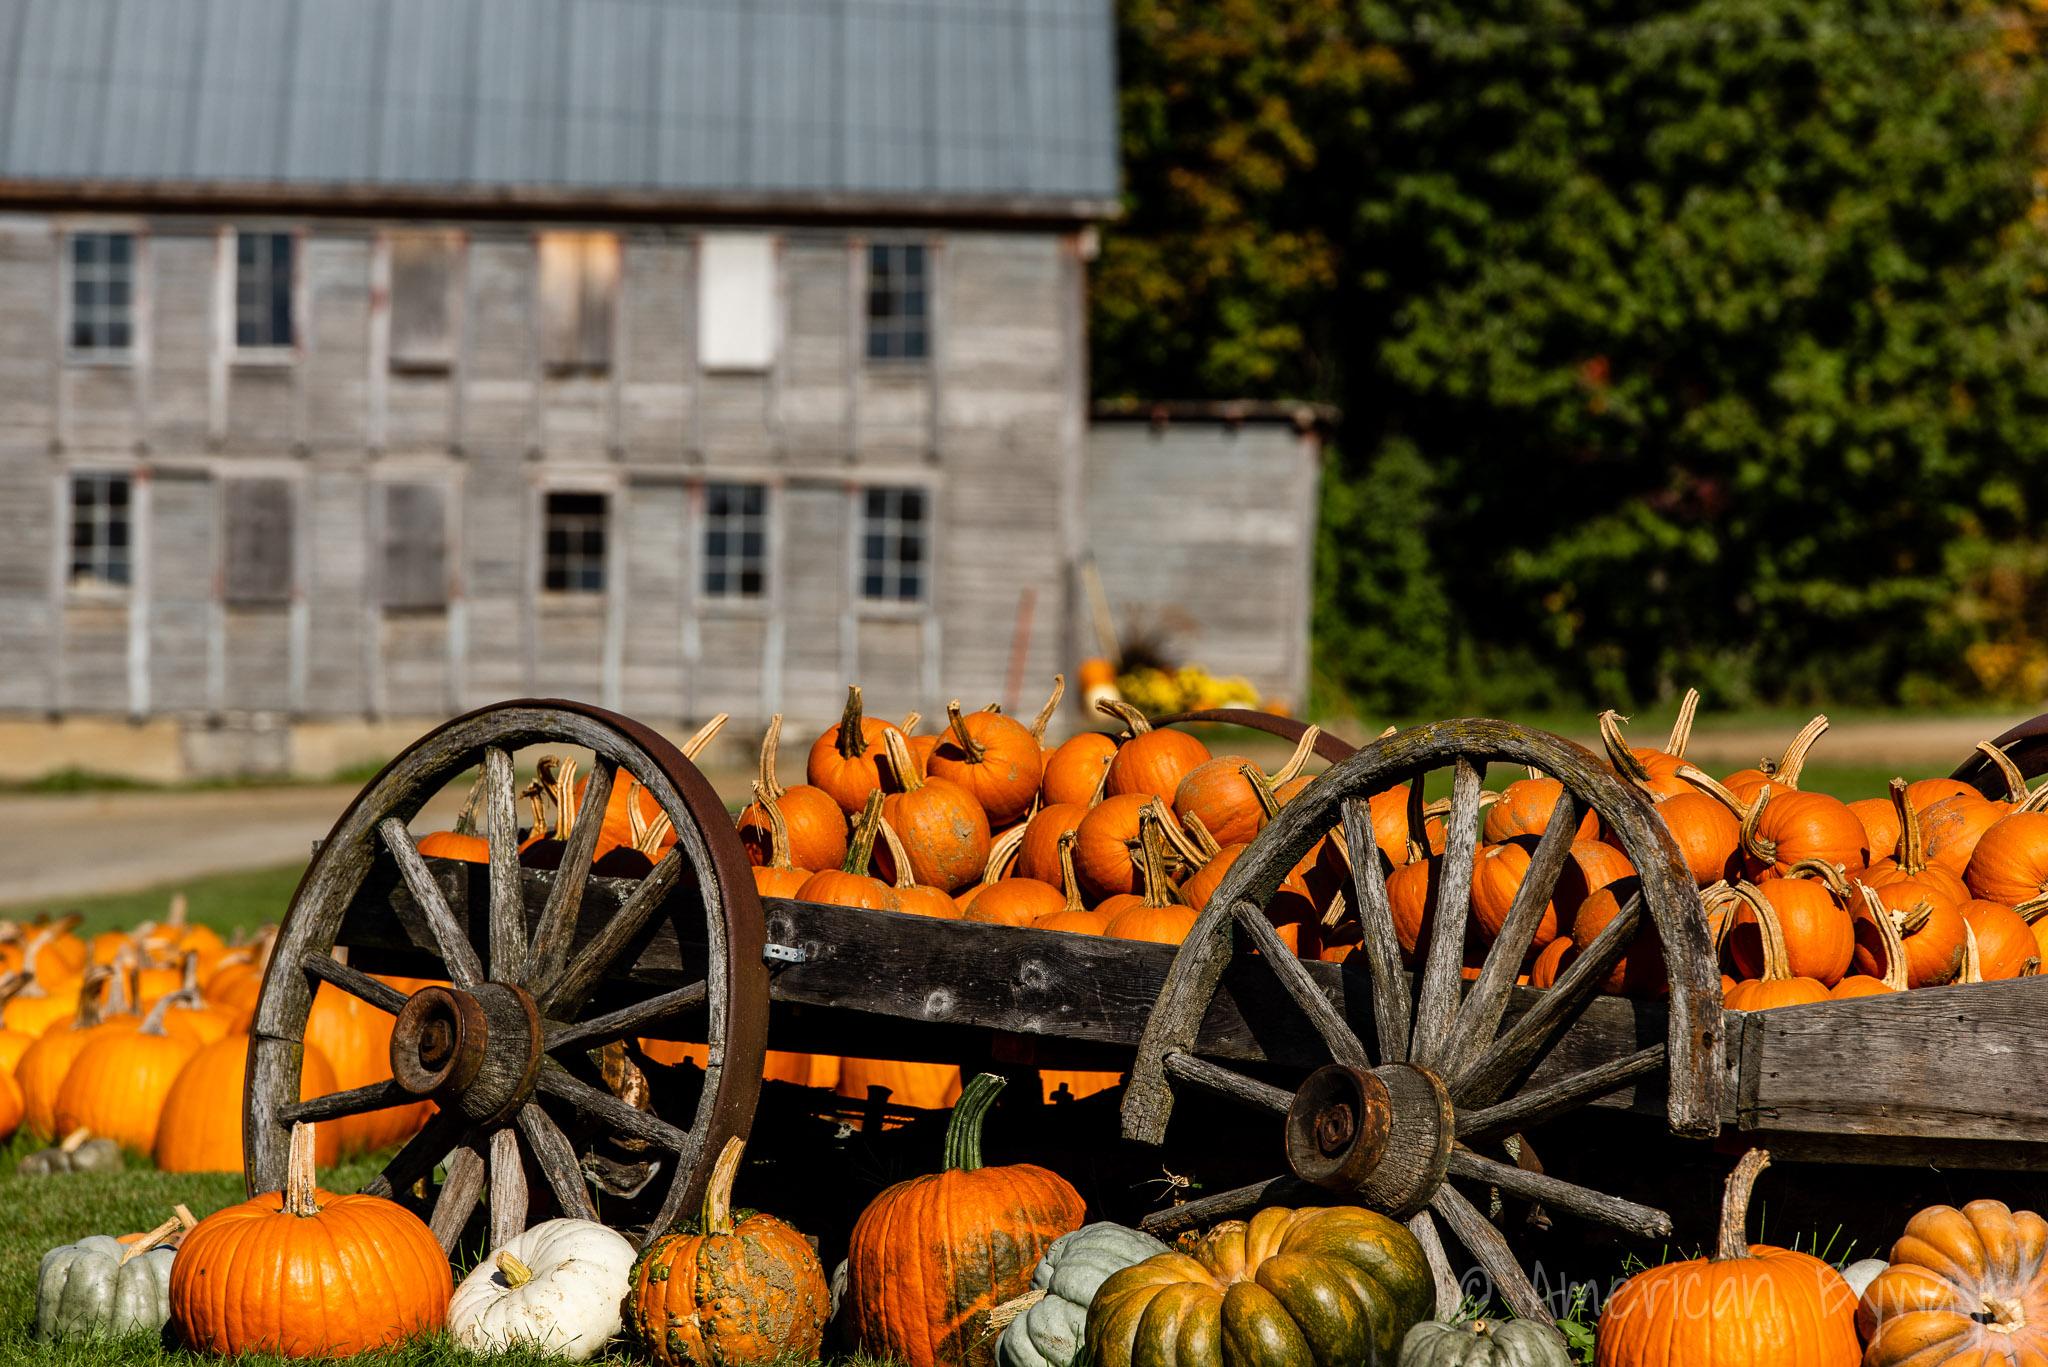 Stowe Pumpkins